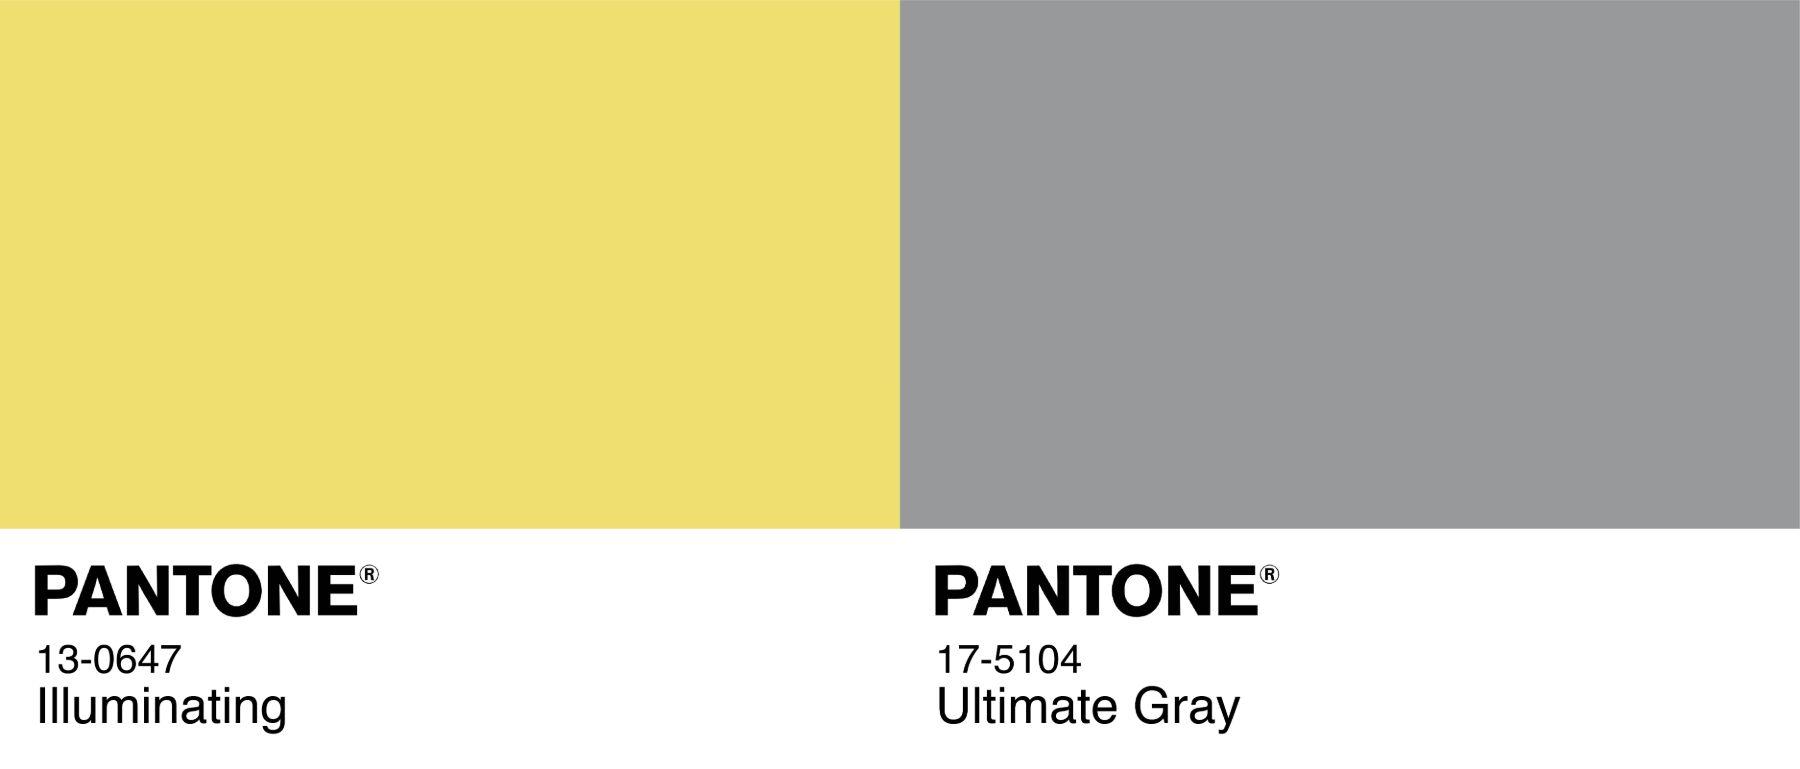 Meet your PANTONE Colours for 2021 - Lookiero Blog